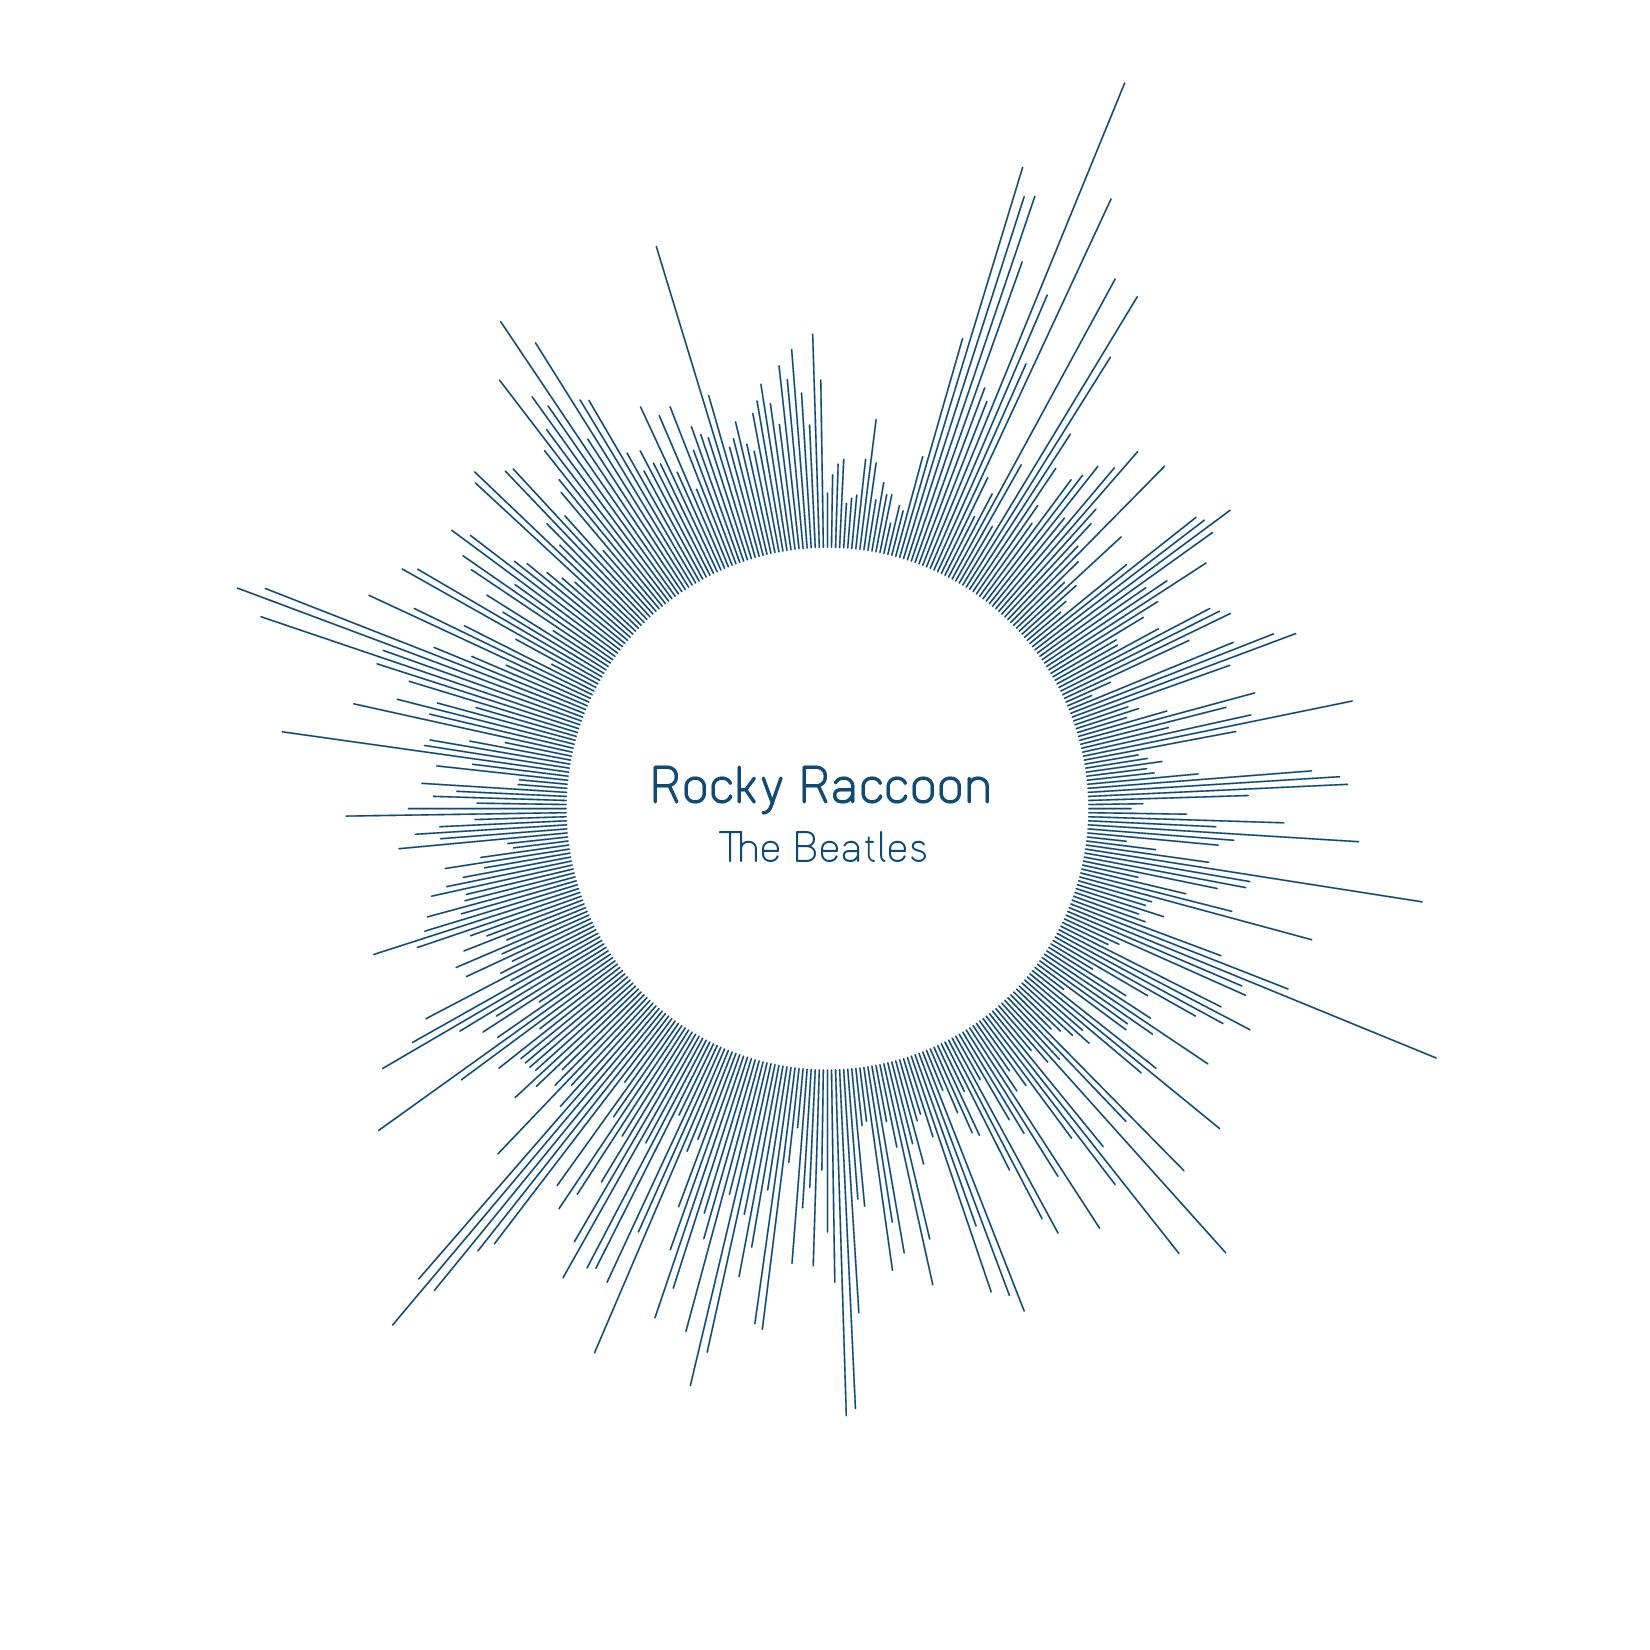 Rocky Raccoon The Beatles Circular Pattern Concept Design Rocky Raccoon